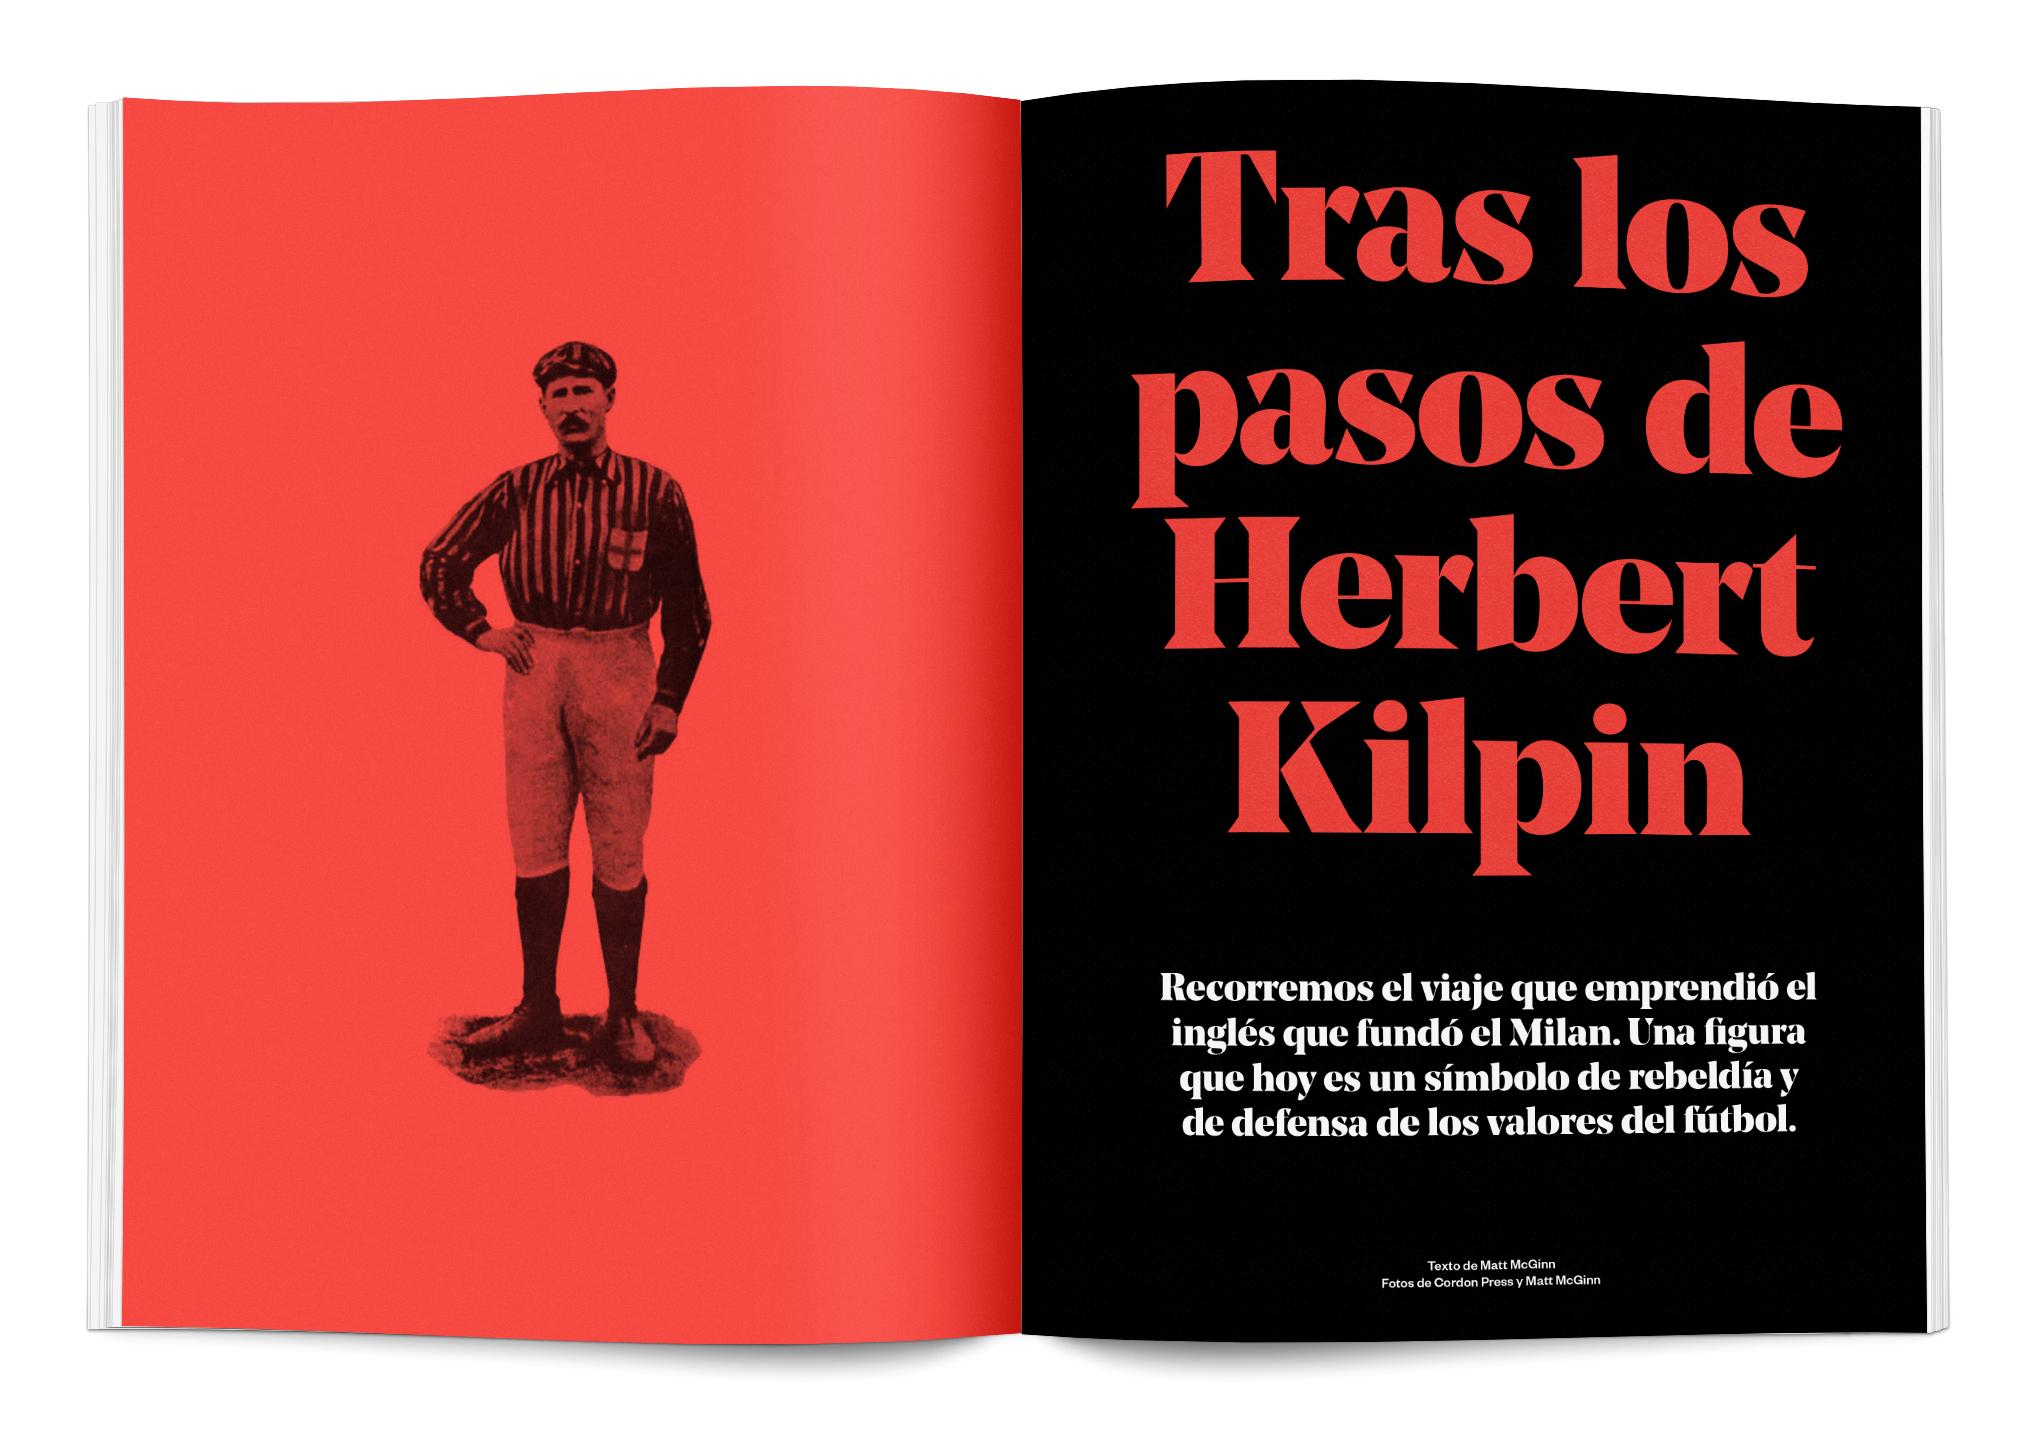 tras los pasos de Herbert Kilpin